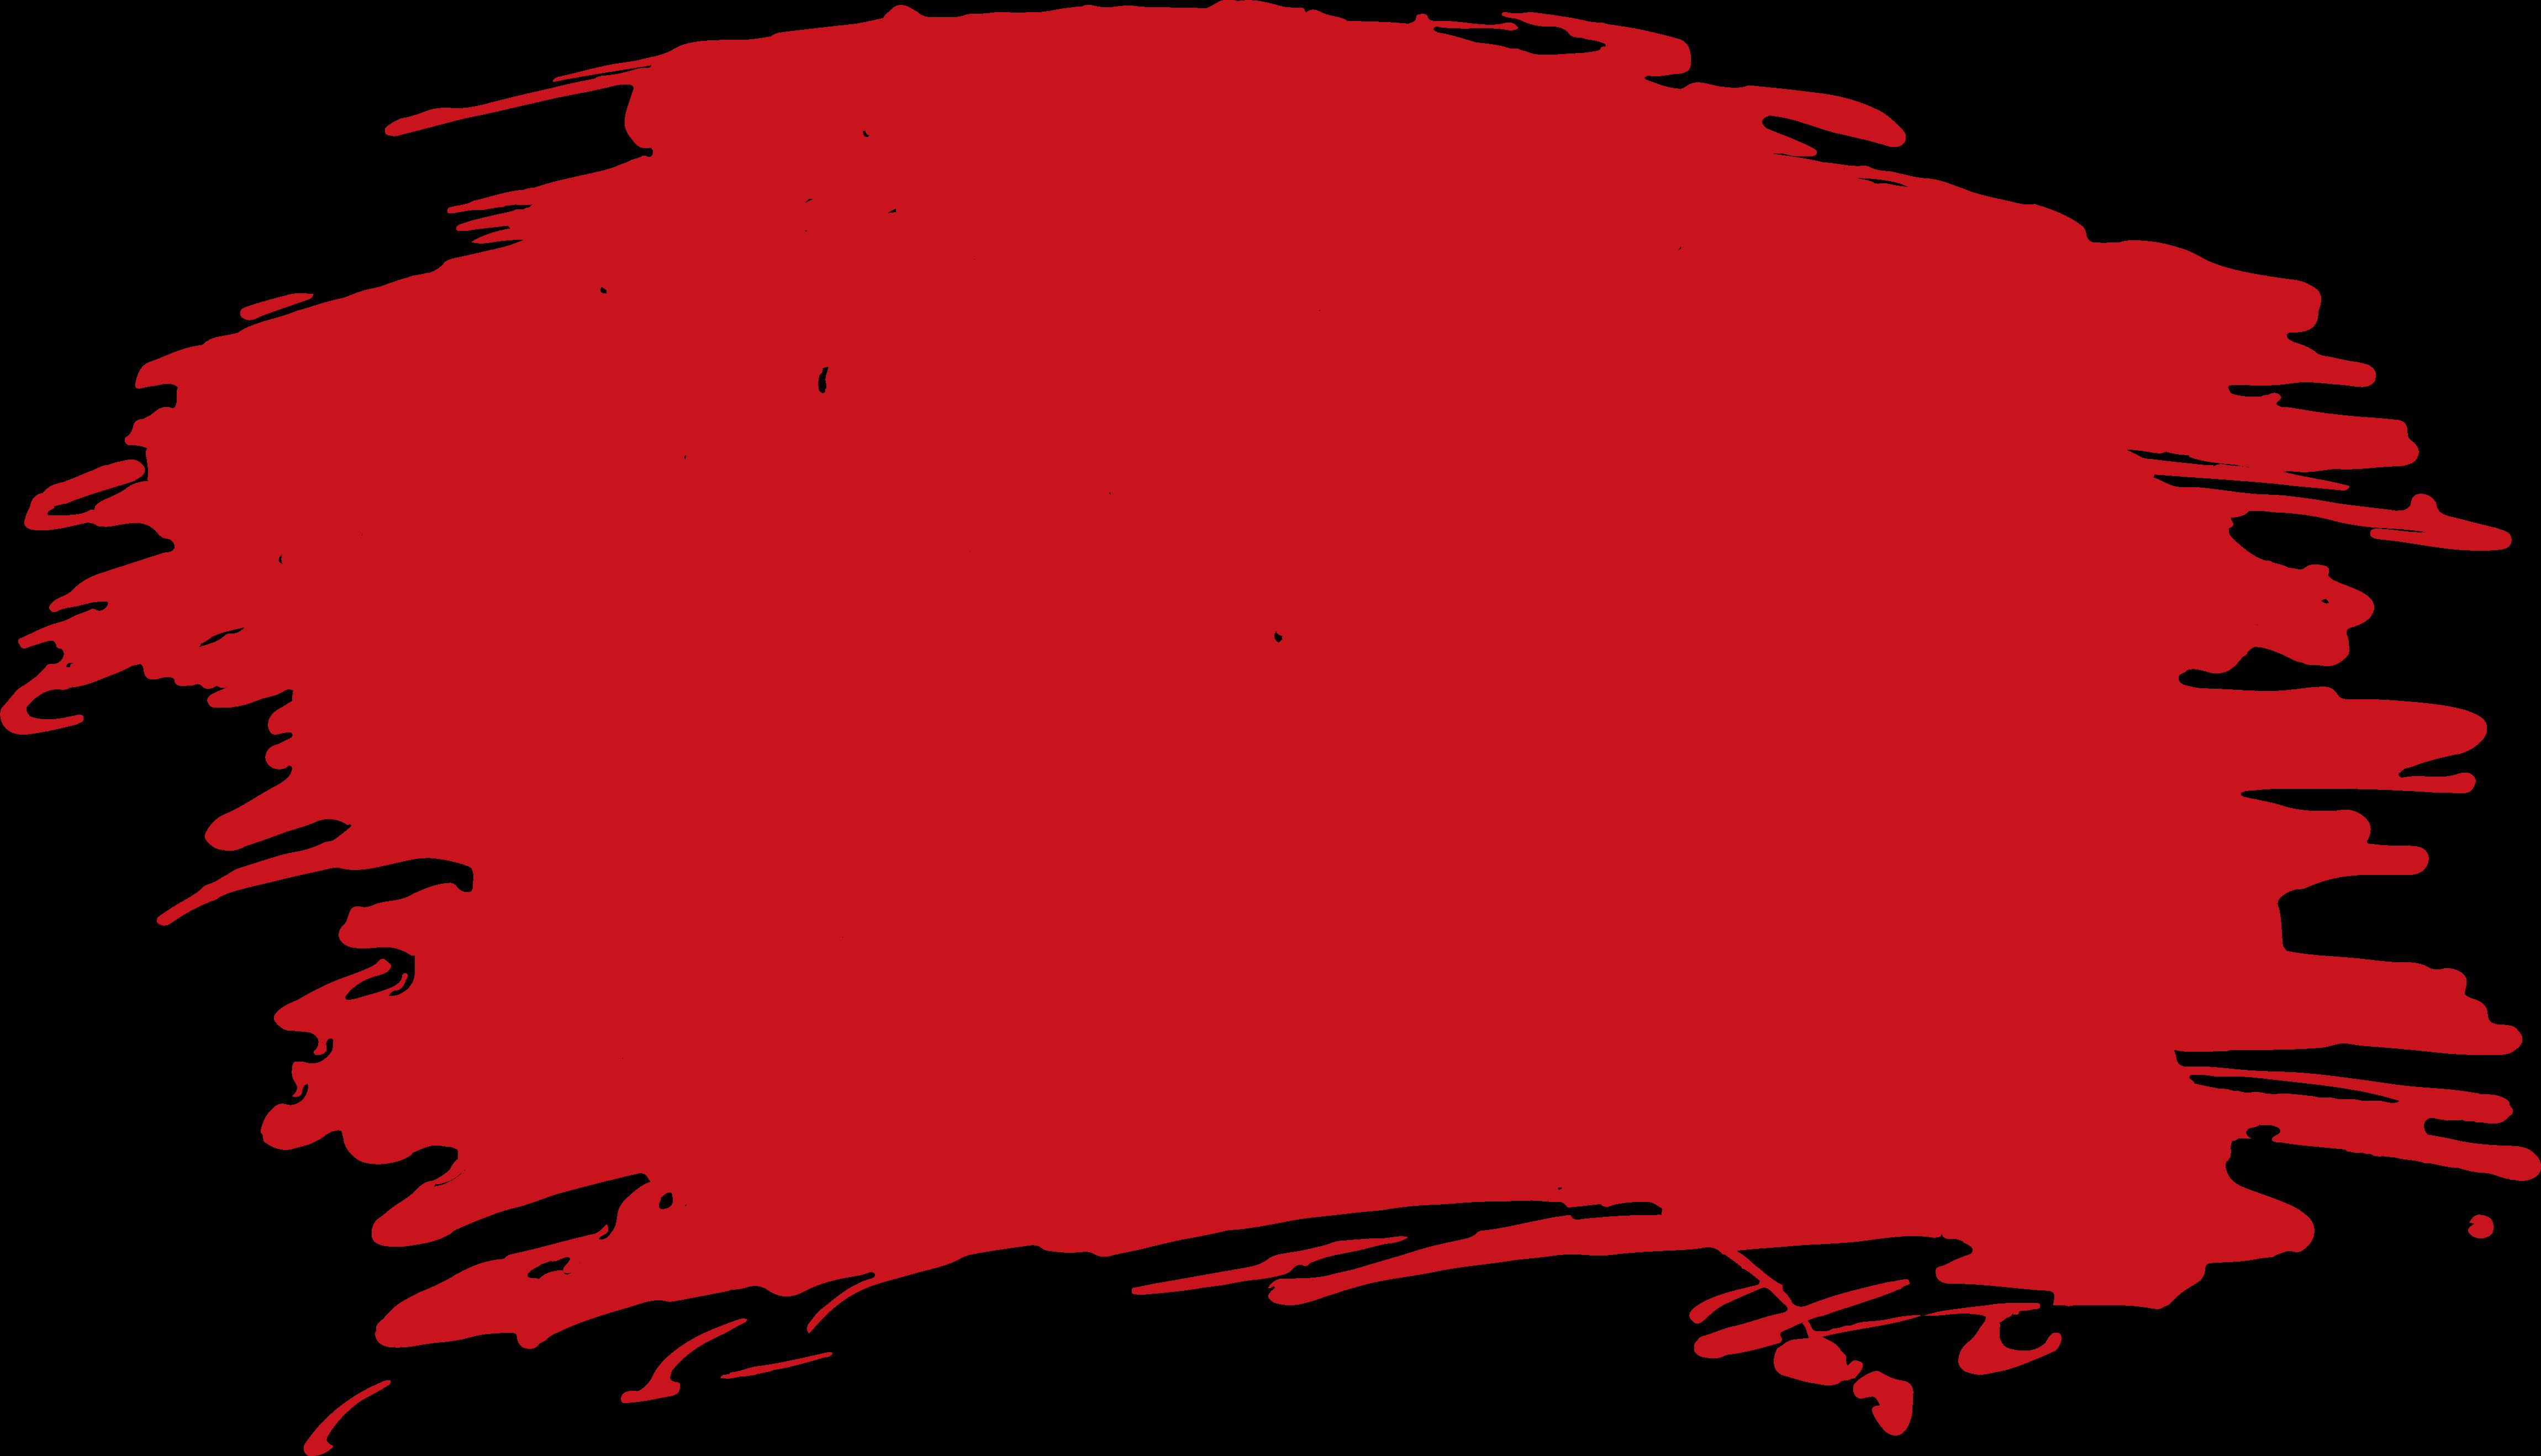 Red Paint Splatter Footer Paint Splash Paint Splatter Red Paint